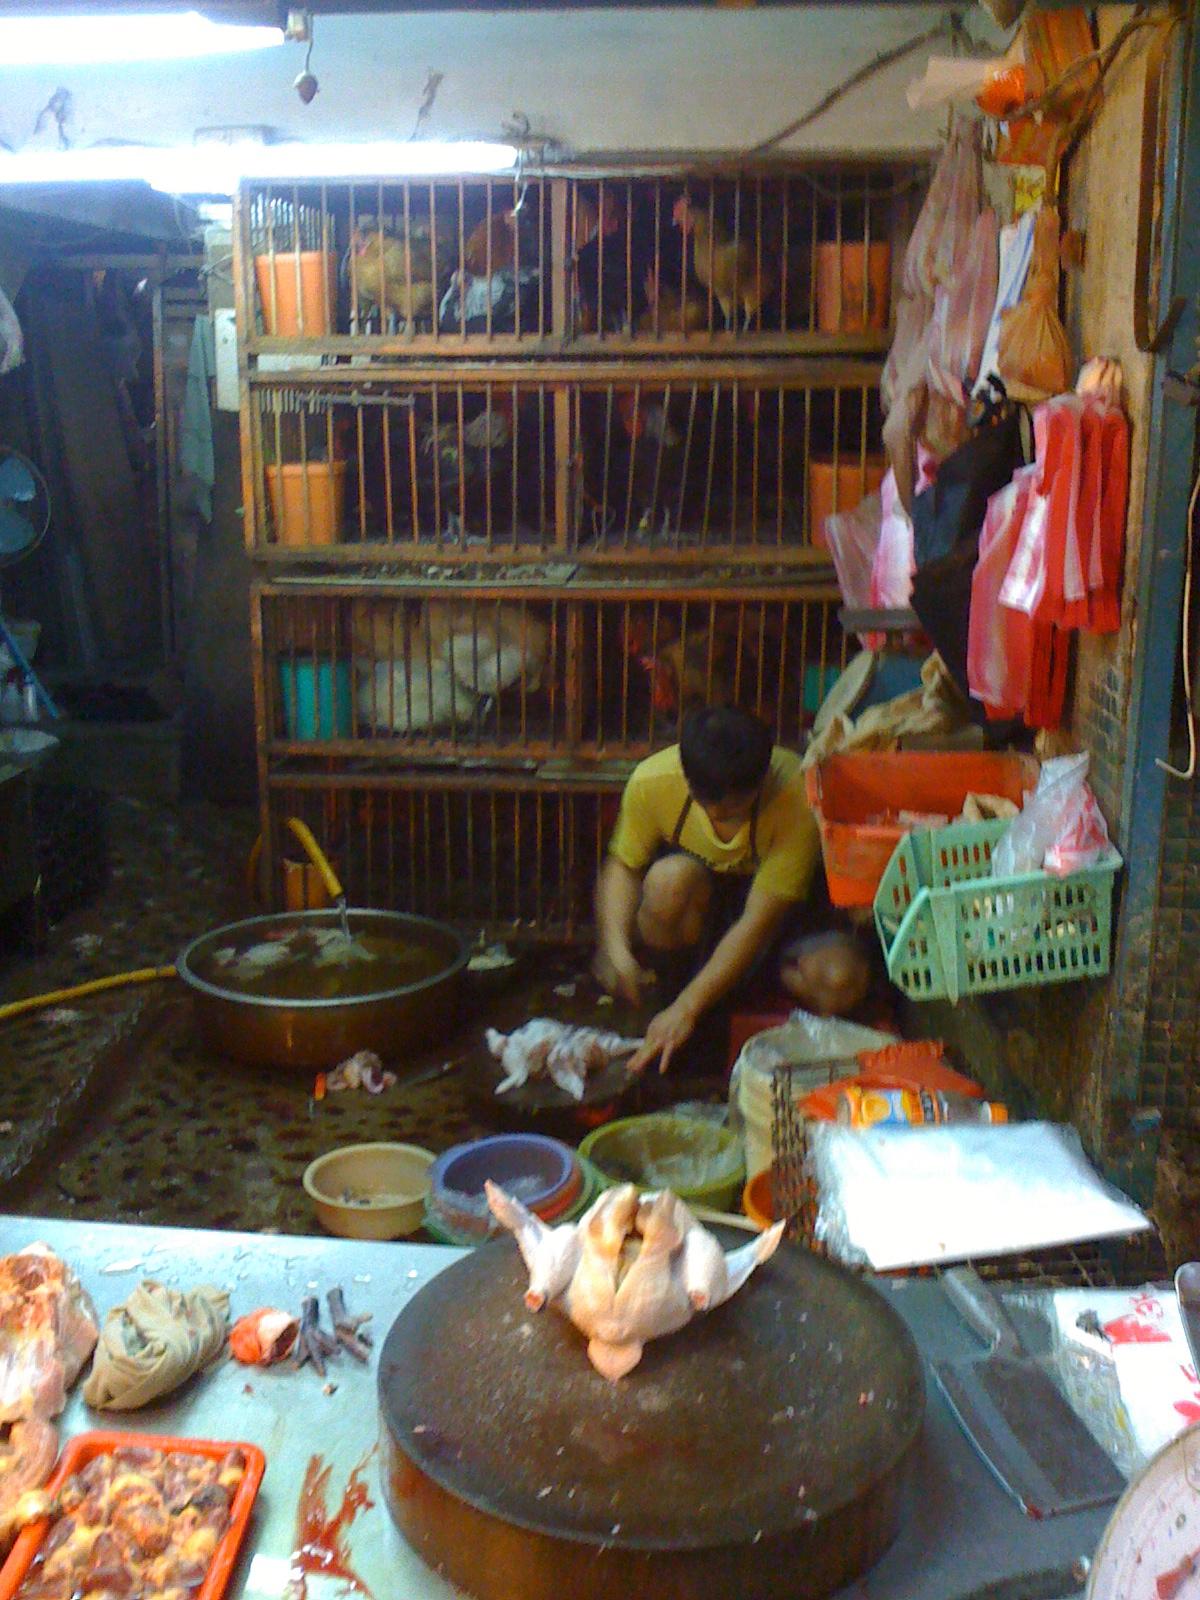 chicken butchering